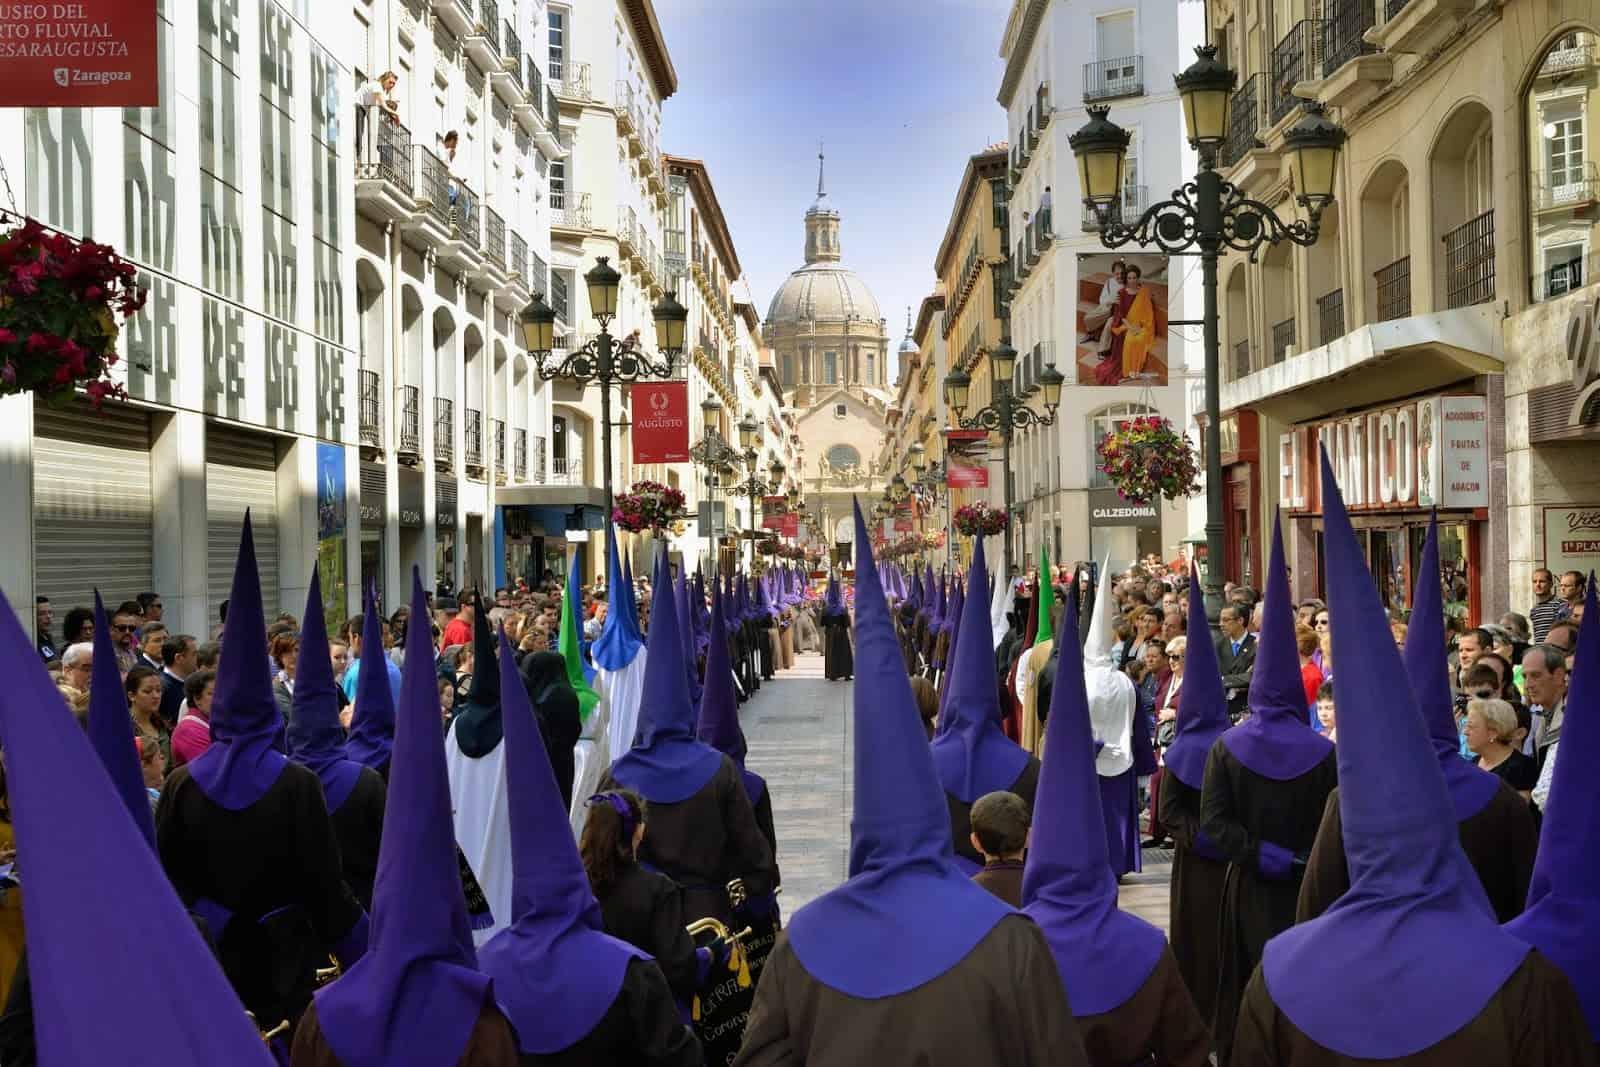 Semana Santa en Zaragoza, vívela en primera persona